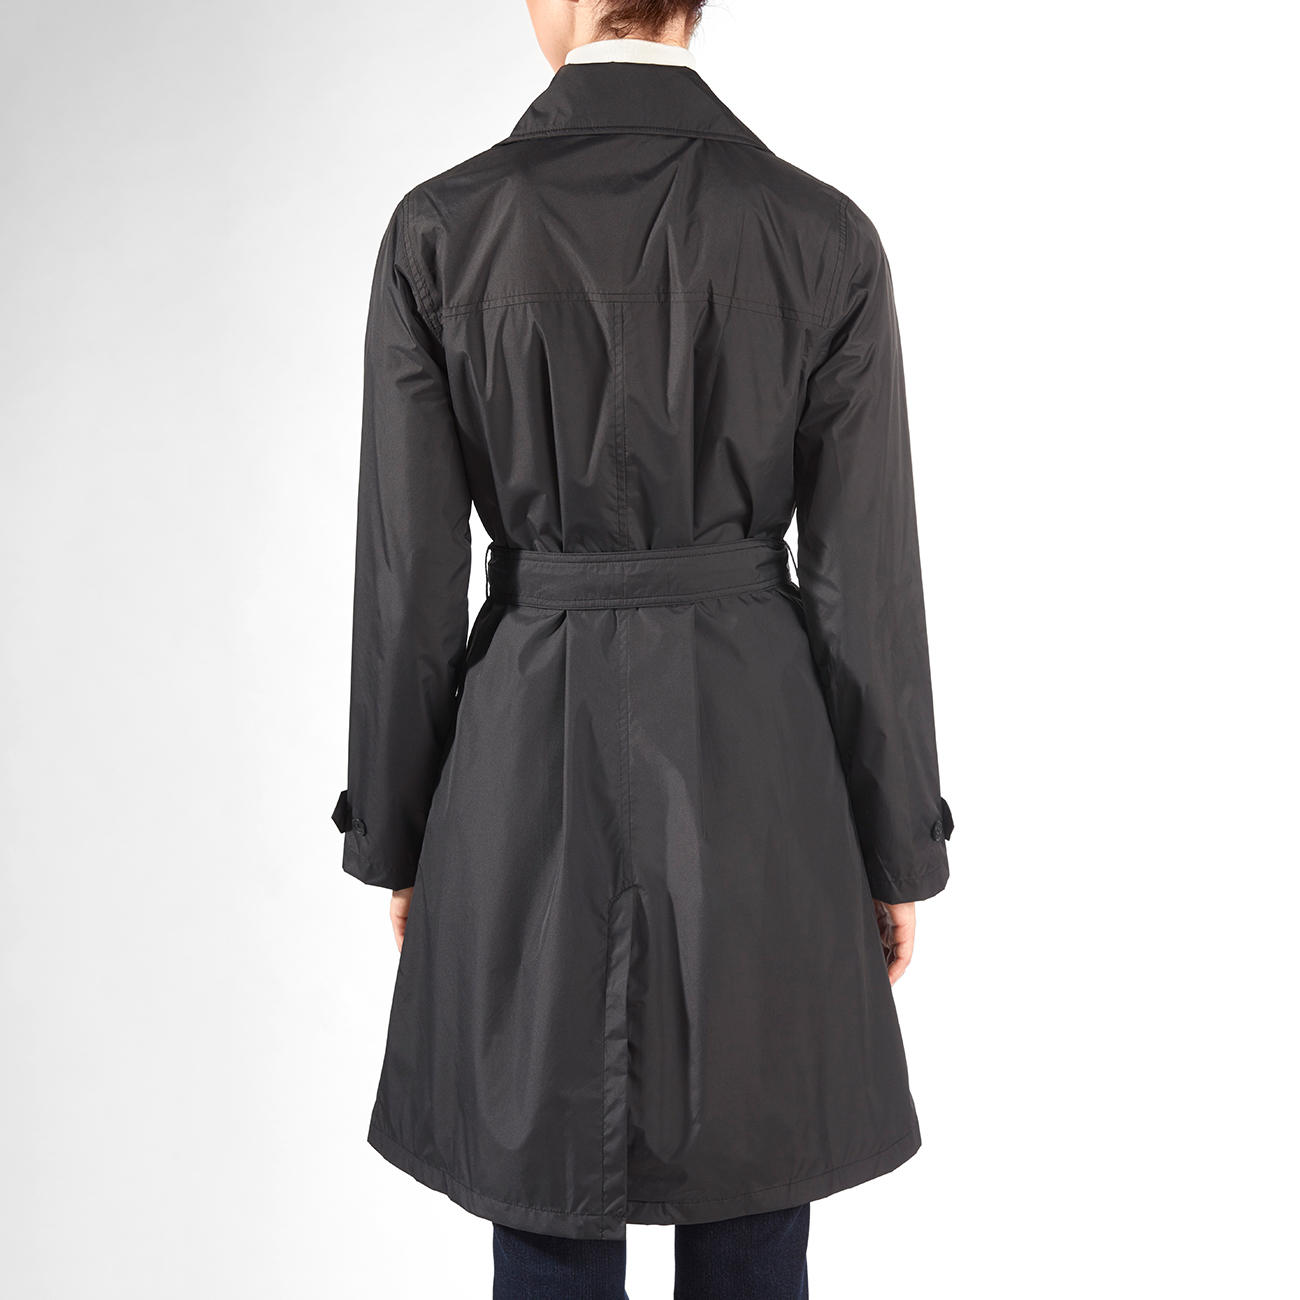 new style afed8 cdc2b Knirps® Regen-Trenchcoat, Damen | Klassiker entdecken